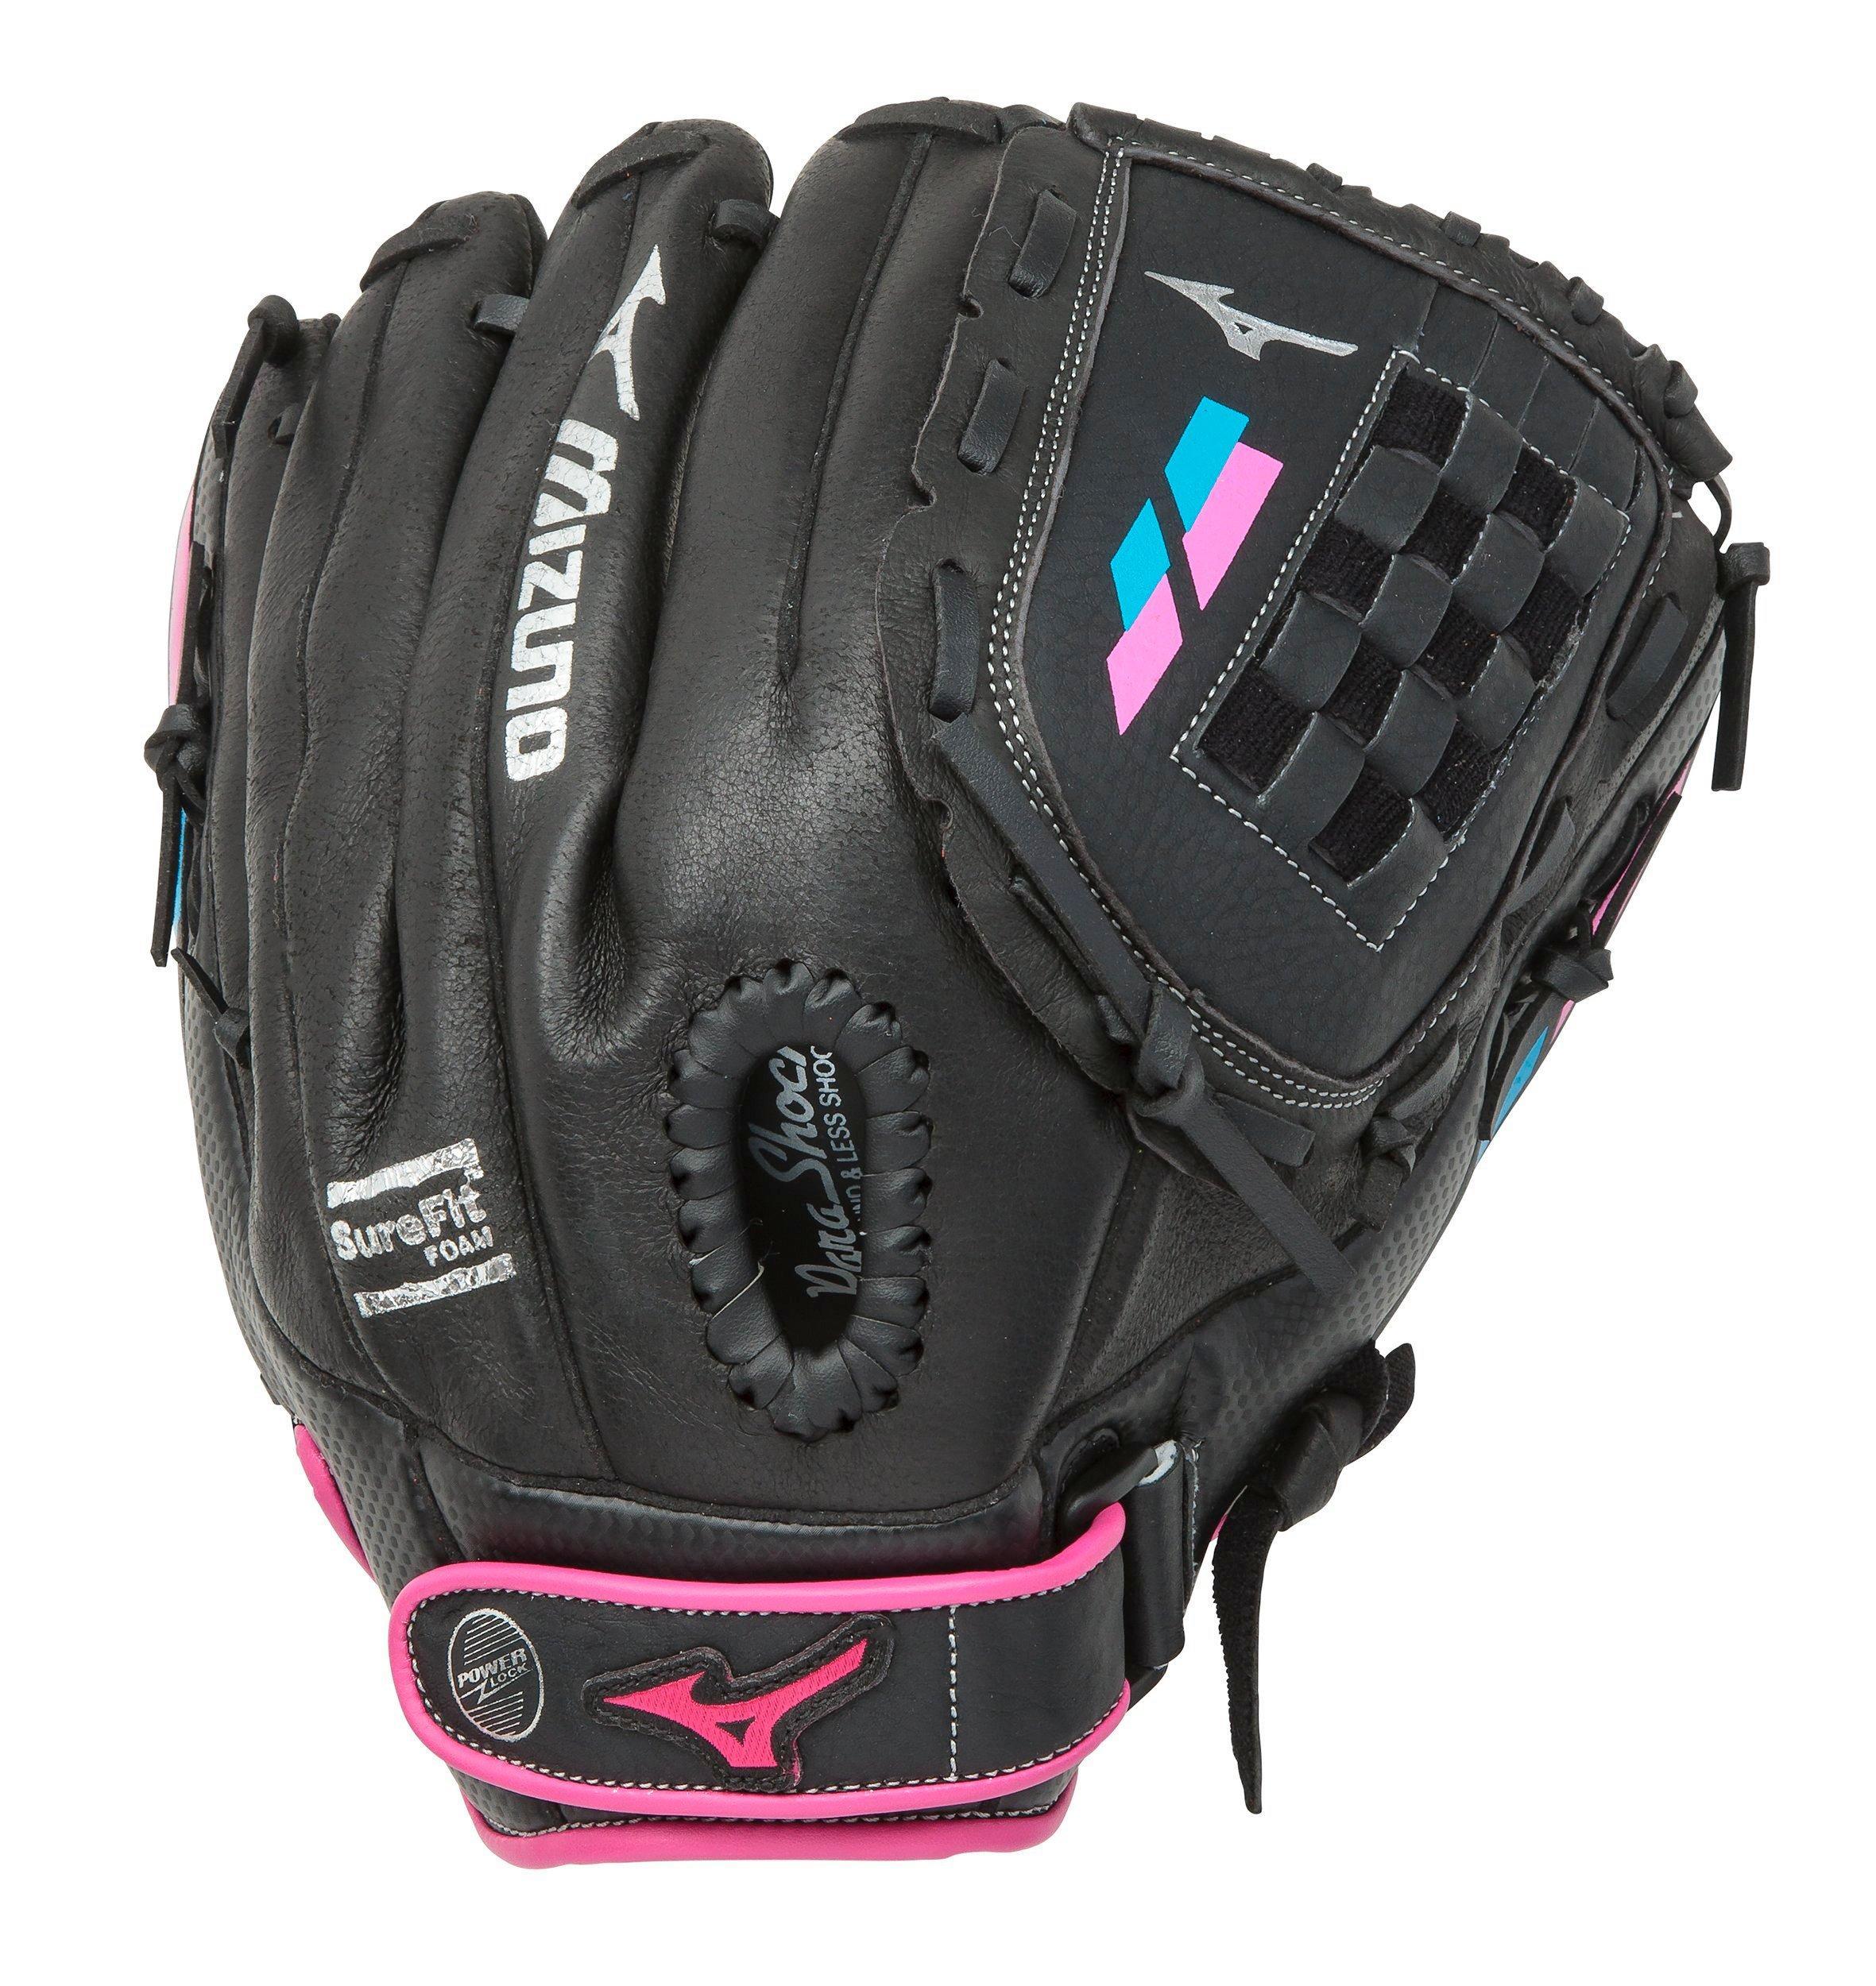 Mizuno  Mizuno Prospect Finch Series Youth Softball Glove 11.5 ... 0aaa054daa